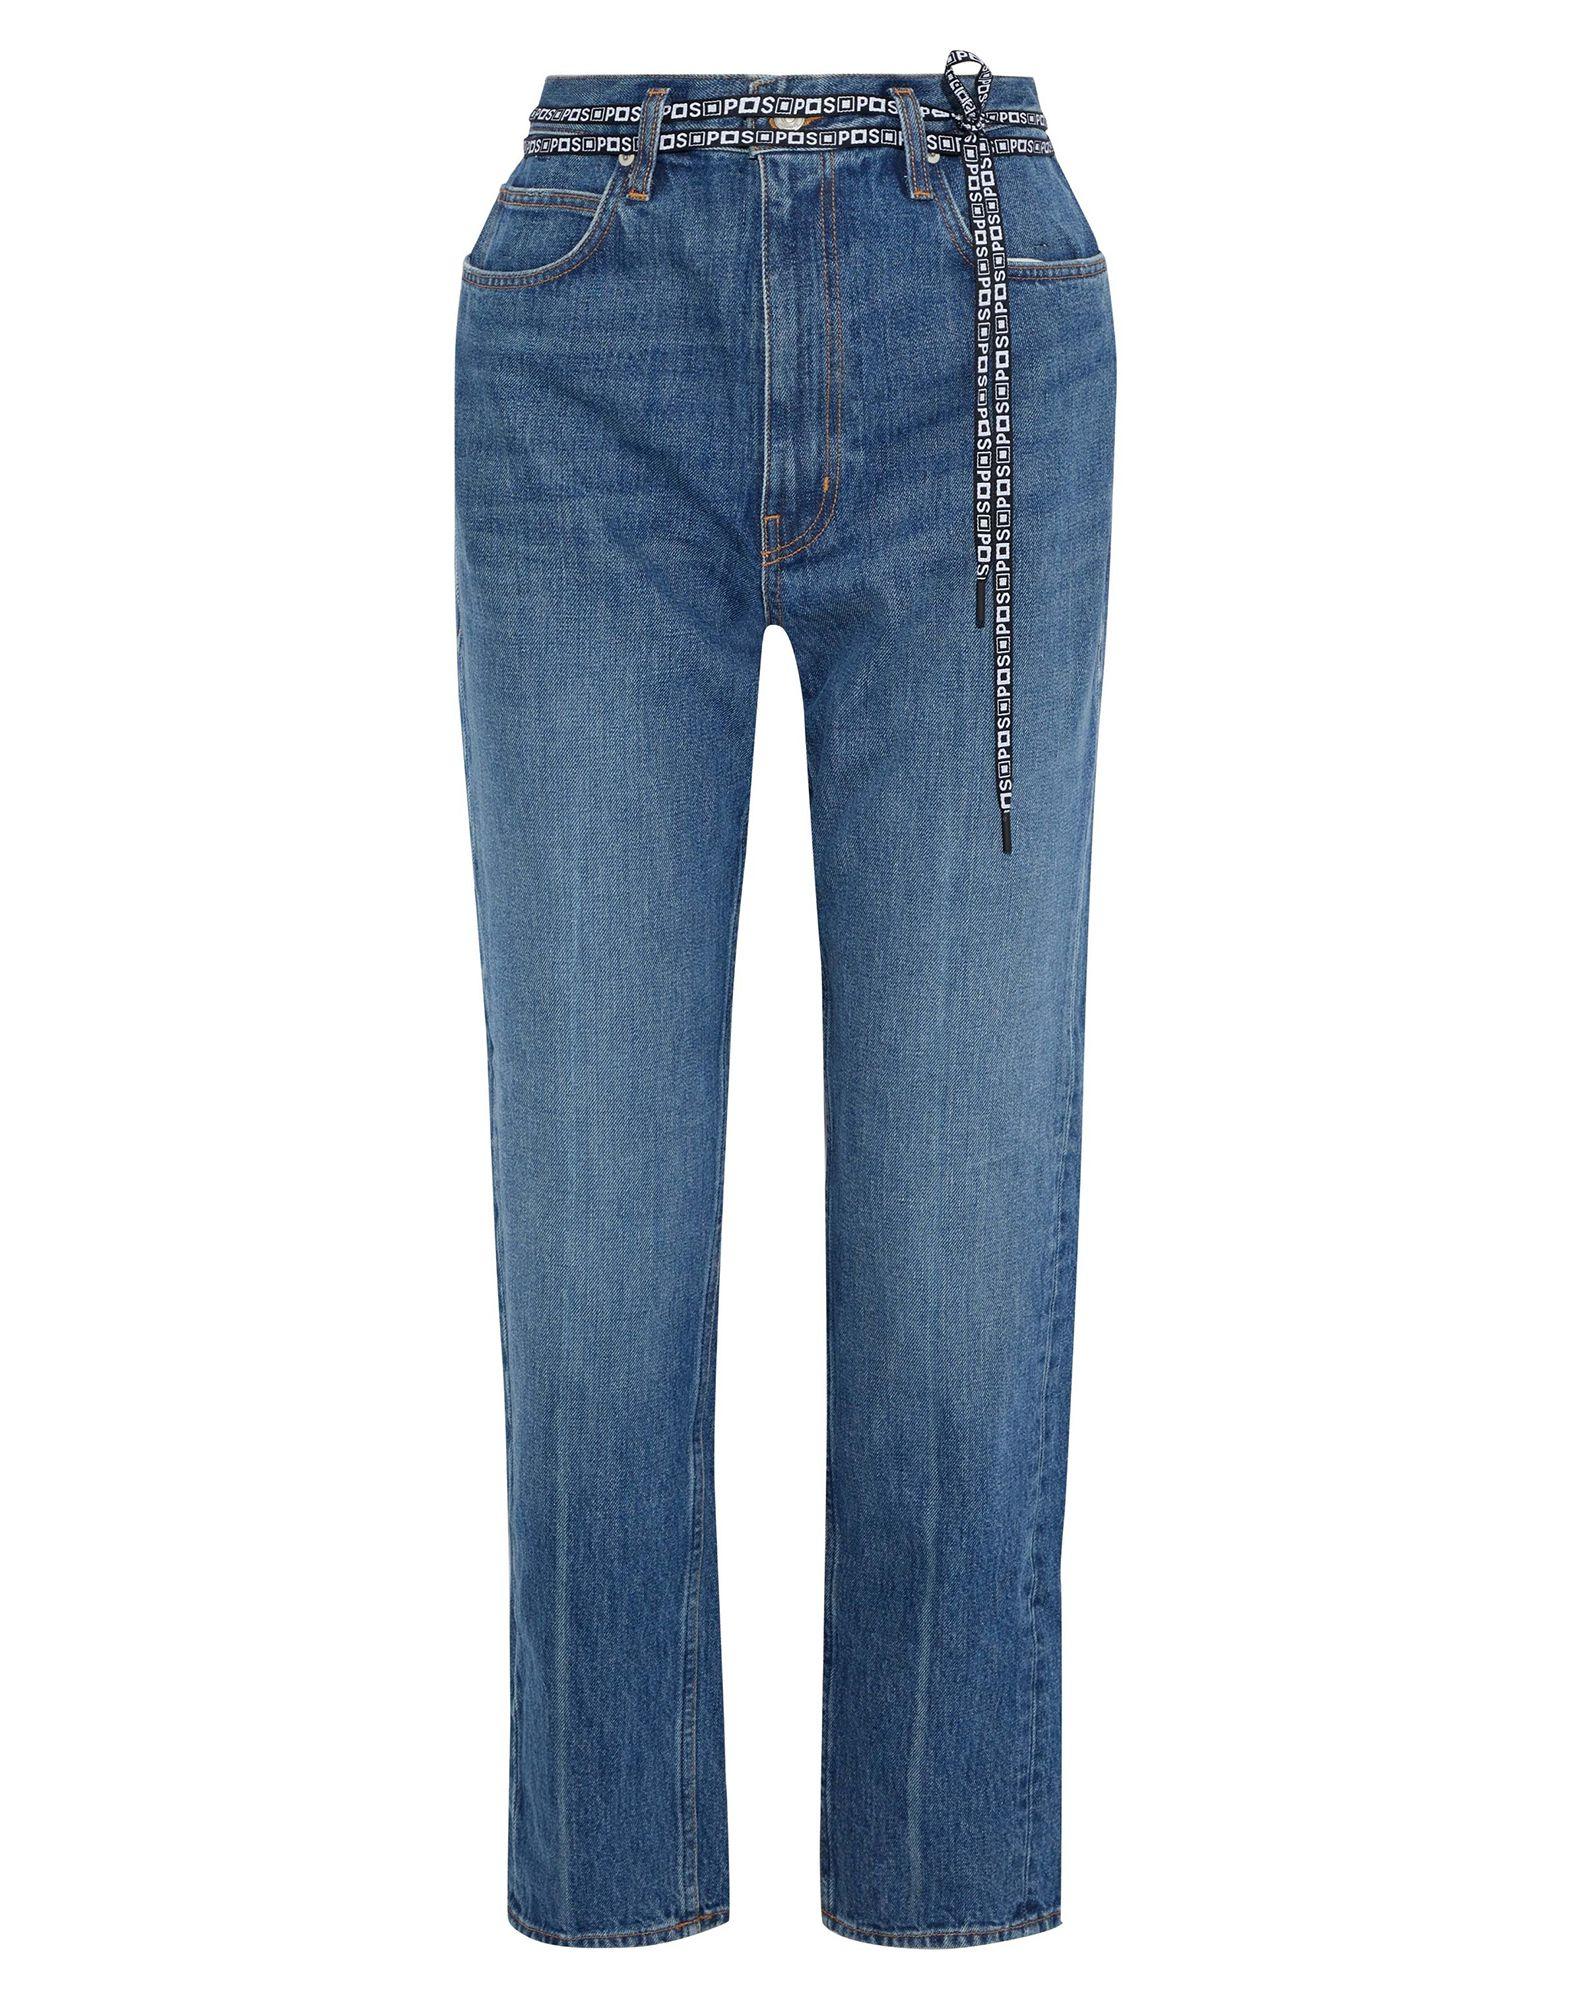 PROENZA SCHOULER Denim pants - Item 42812878